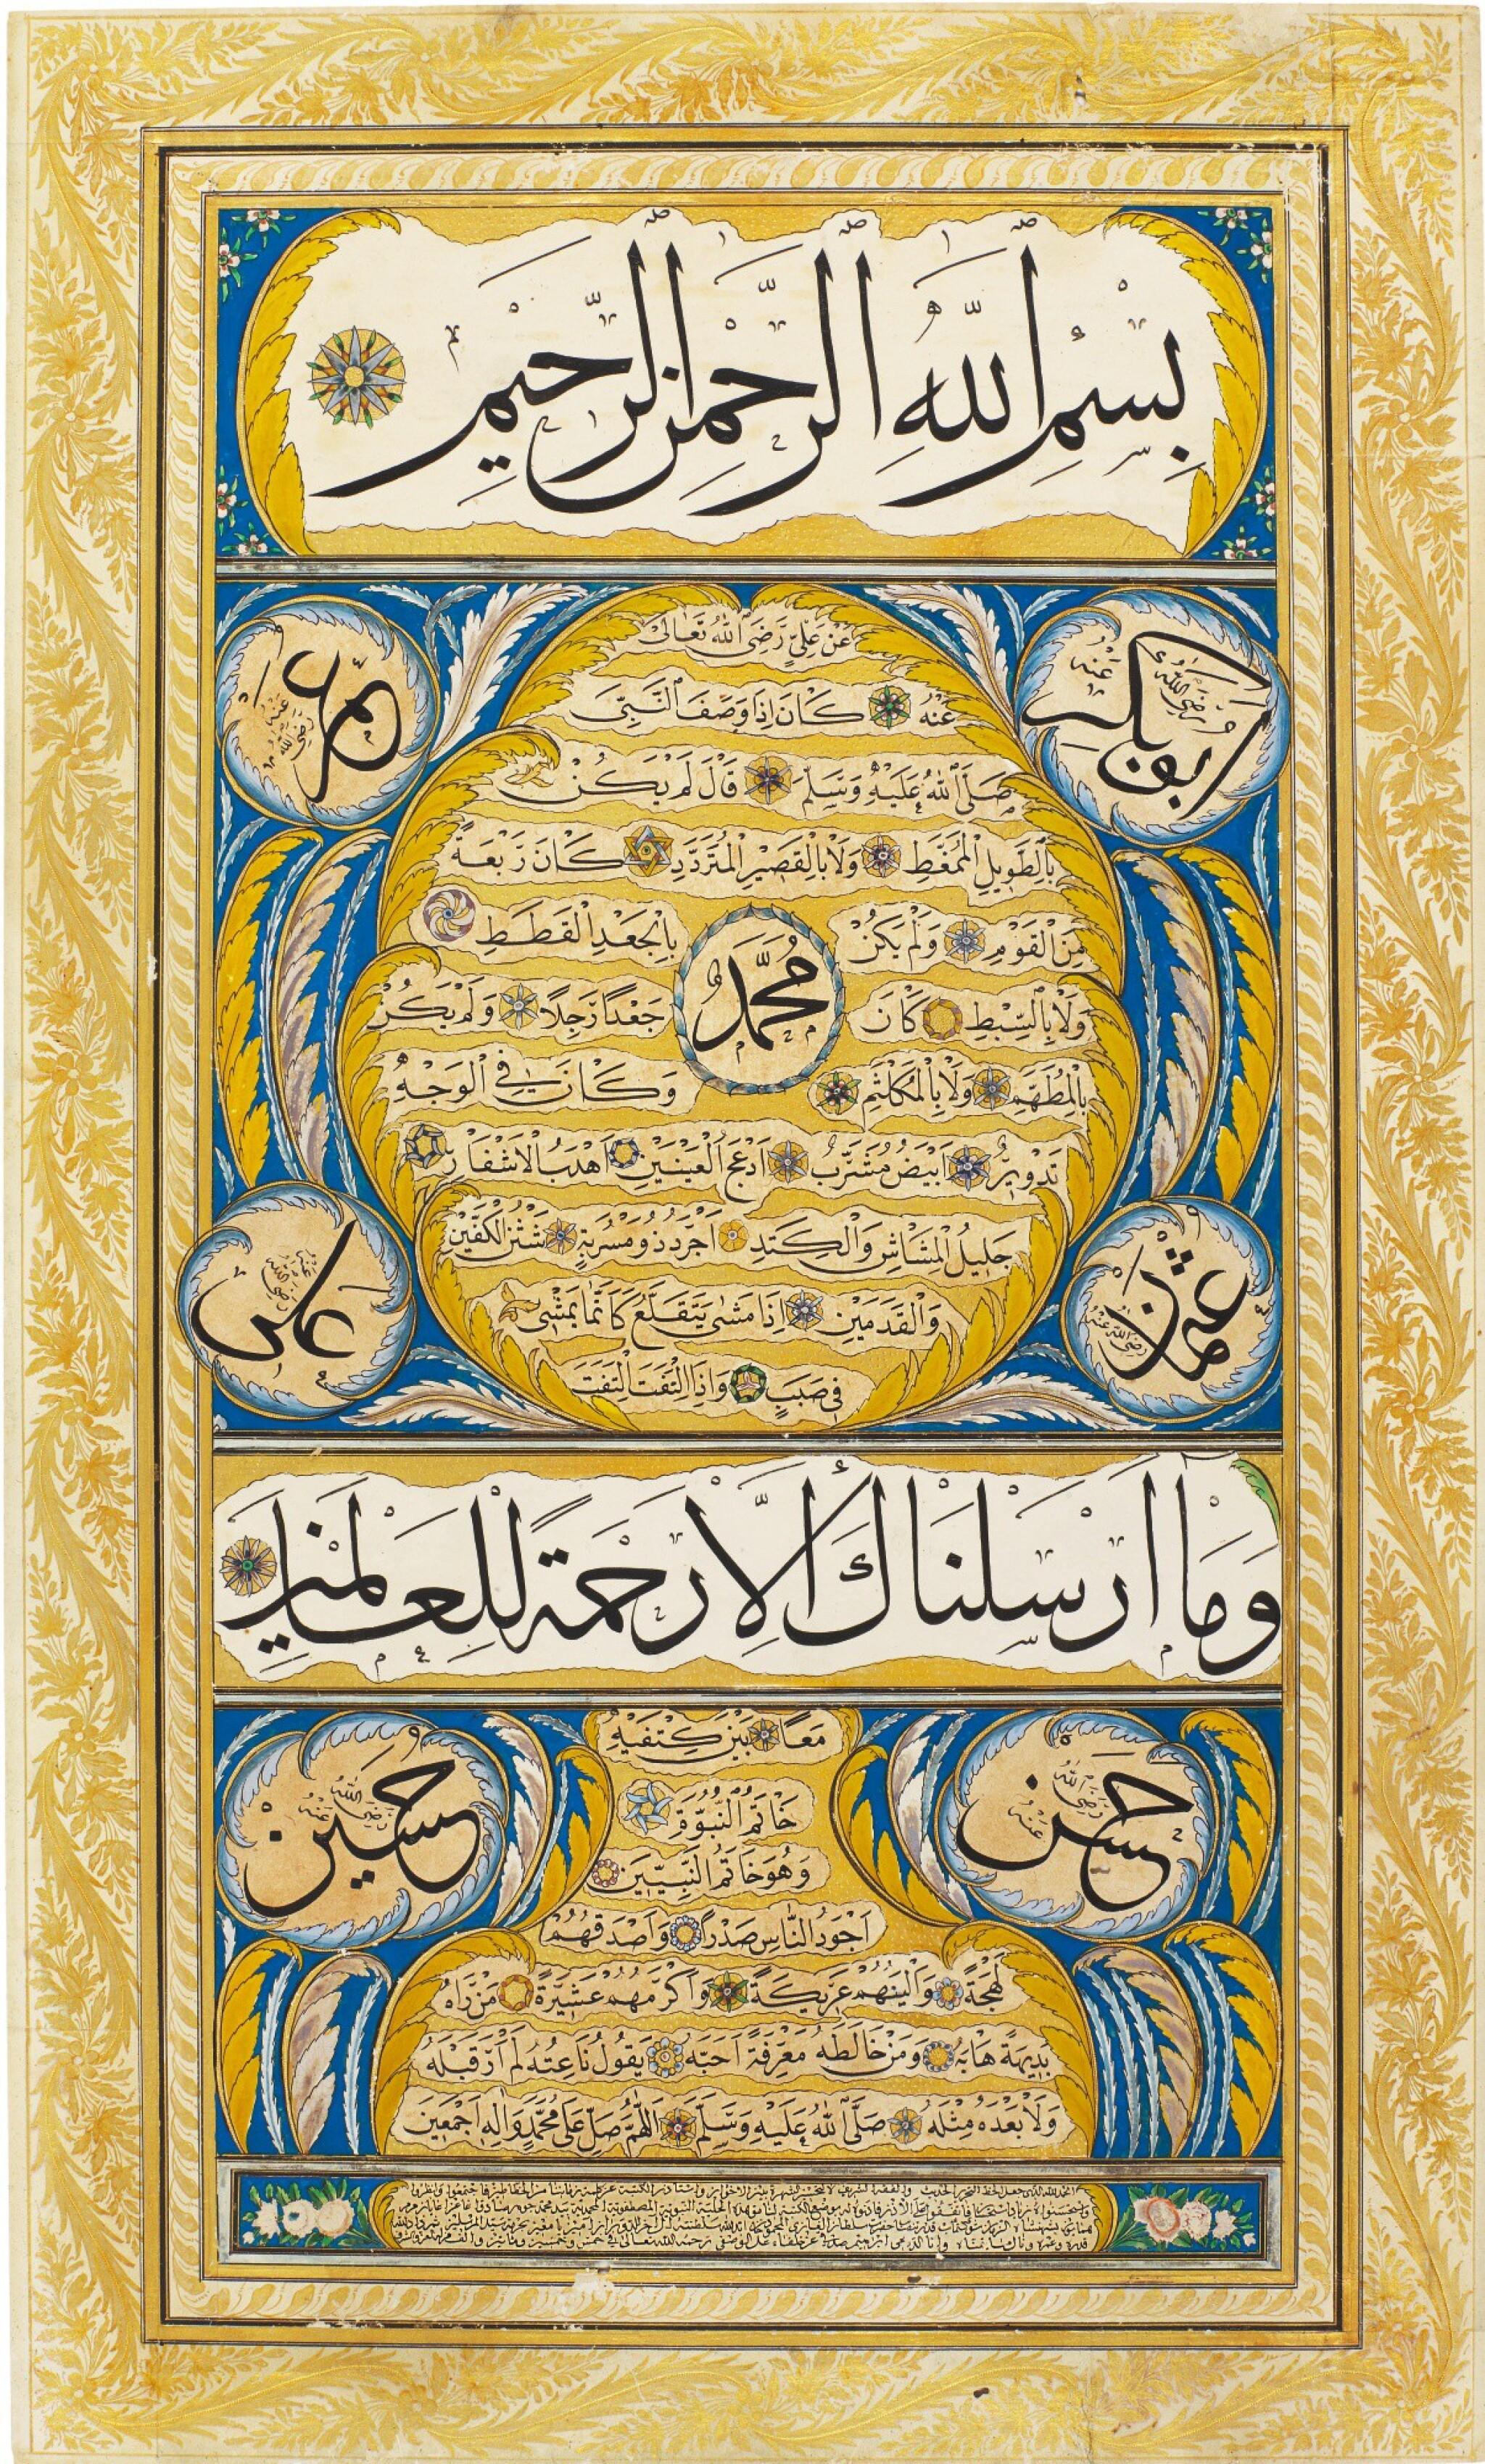 View full screen - View 1 of Lot 41. AN ILLUMINATED HILYE, SIGNED BY MEHMET SADIQ AGHA MERMER HUMAYUN SHAHINSHAH, TURKEY, OTTOMAN, DATED 1255 AH/1839-40 AD.